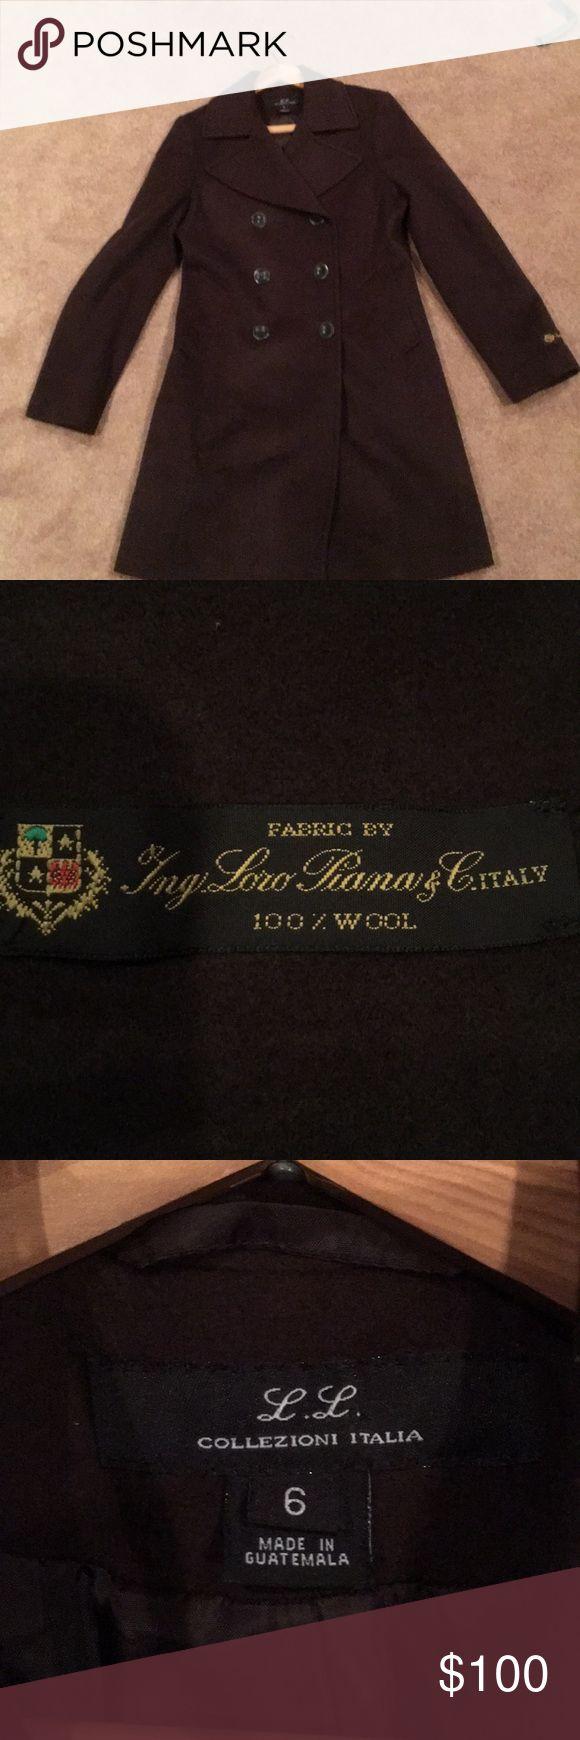 Wool coat Never worn Italian wool coat Loro Piana Jackets & Coats Pea Coats